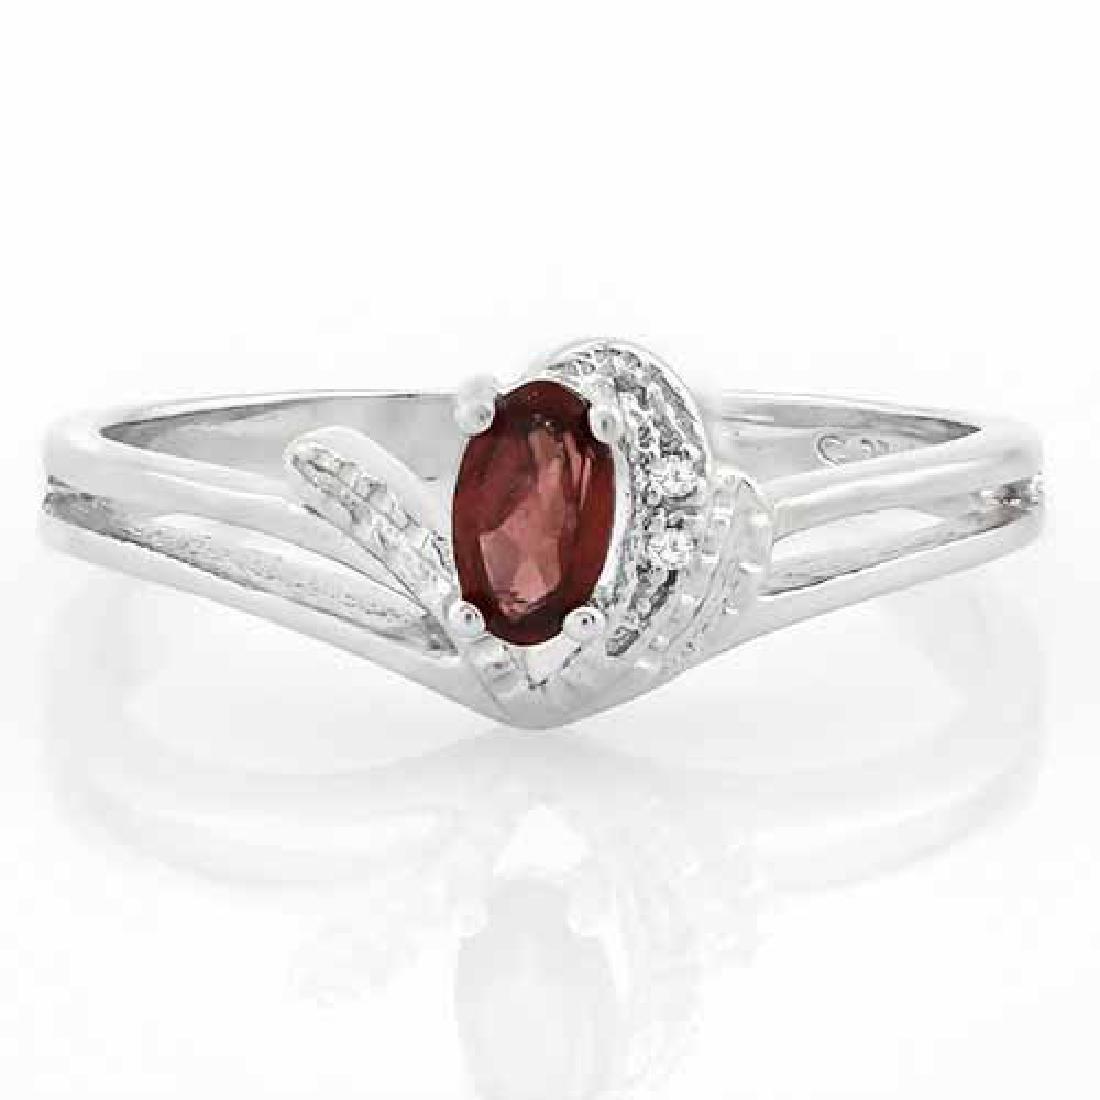 1/4 CARAT GARNET & DIAMOND 925 STERLING SILVER RING